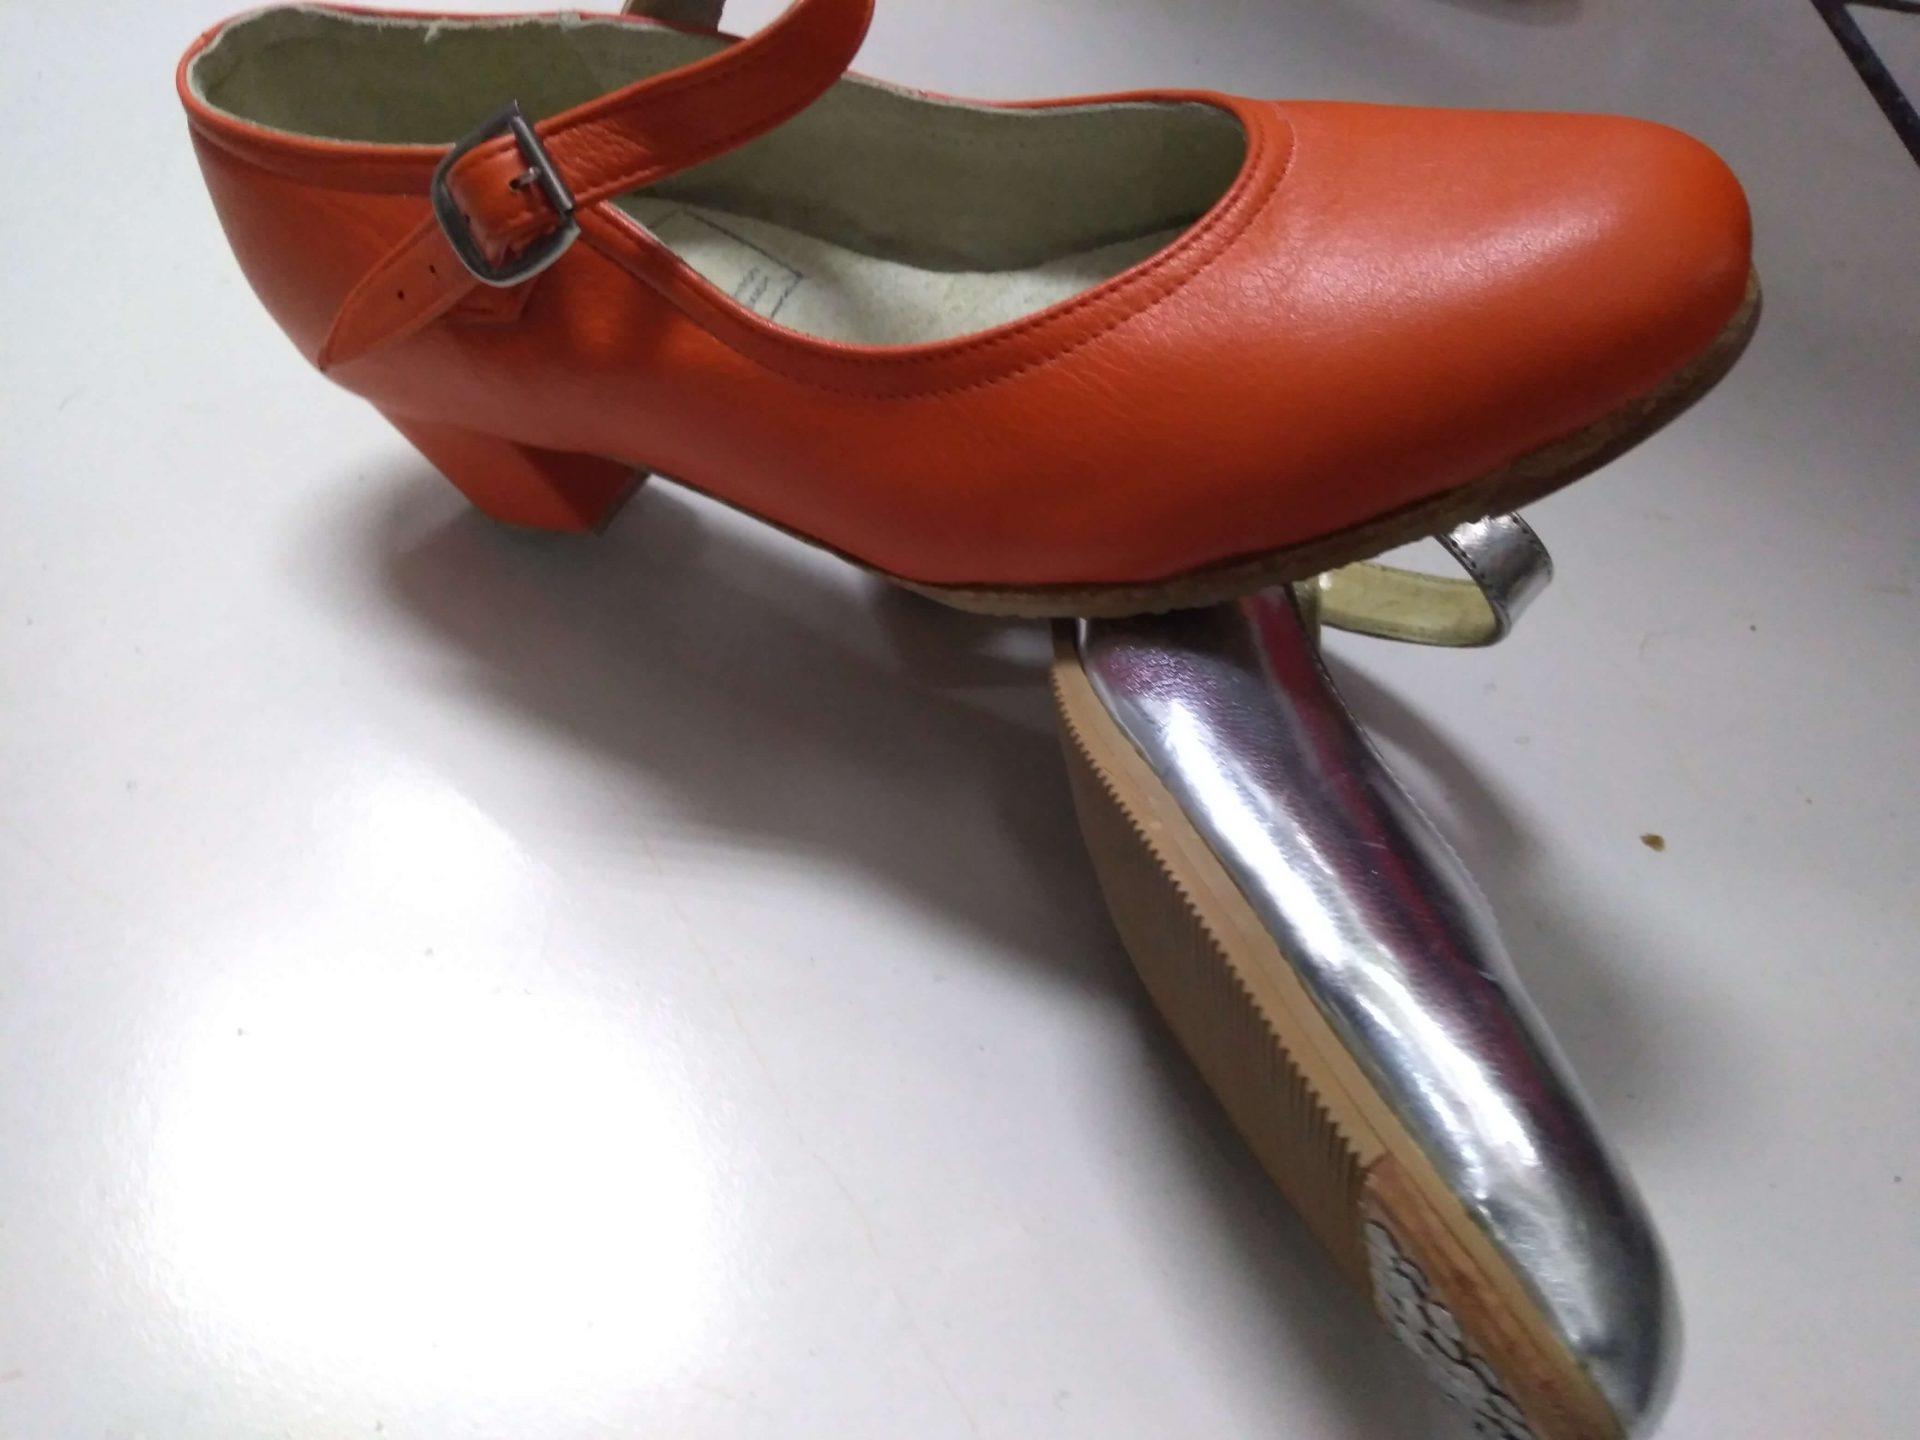 Zapato escolar bota Rodrisan 18 al 21 velcro suela de hule